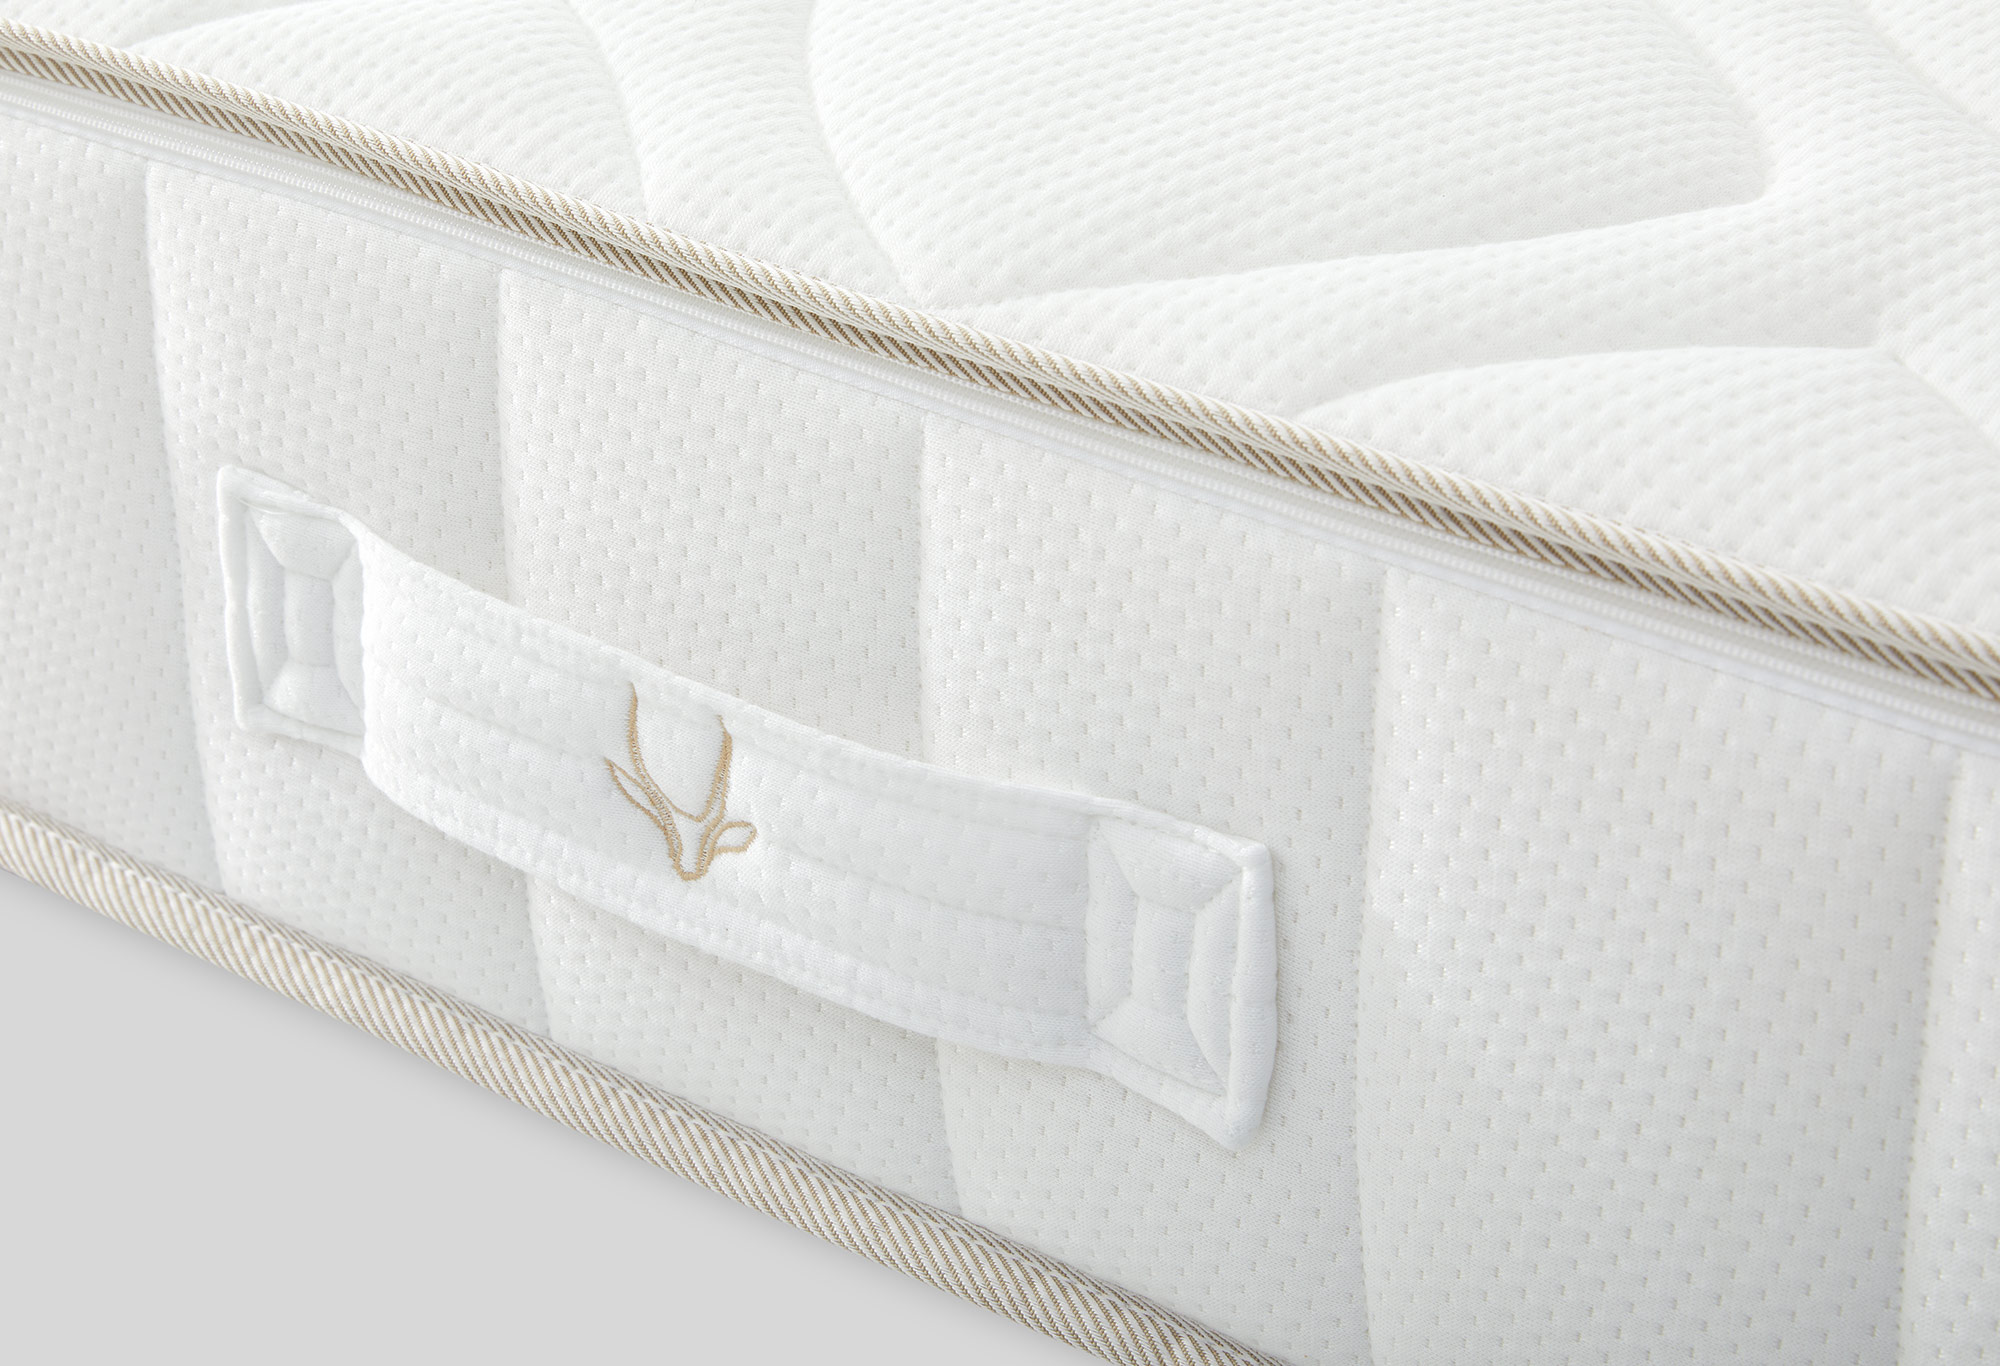 Gazella Comfort III Pocketvering Matras Detail | Swiss Sense